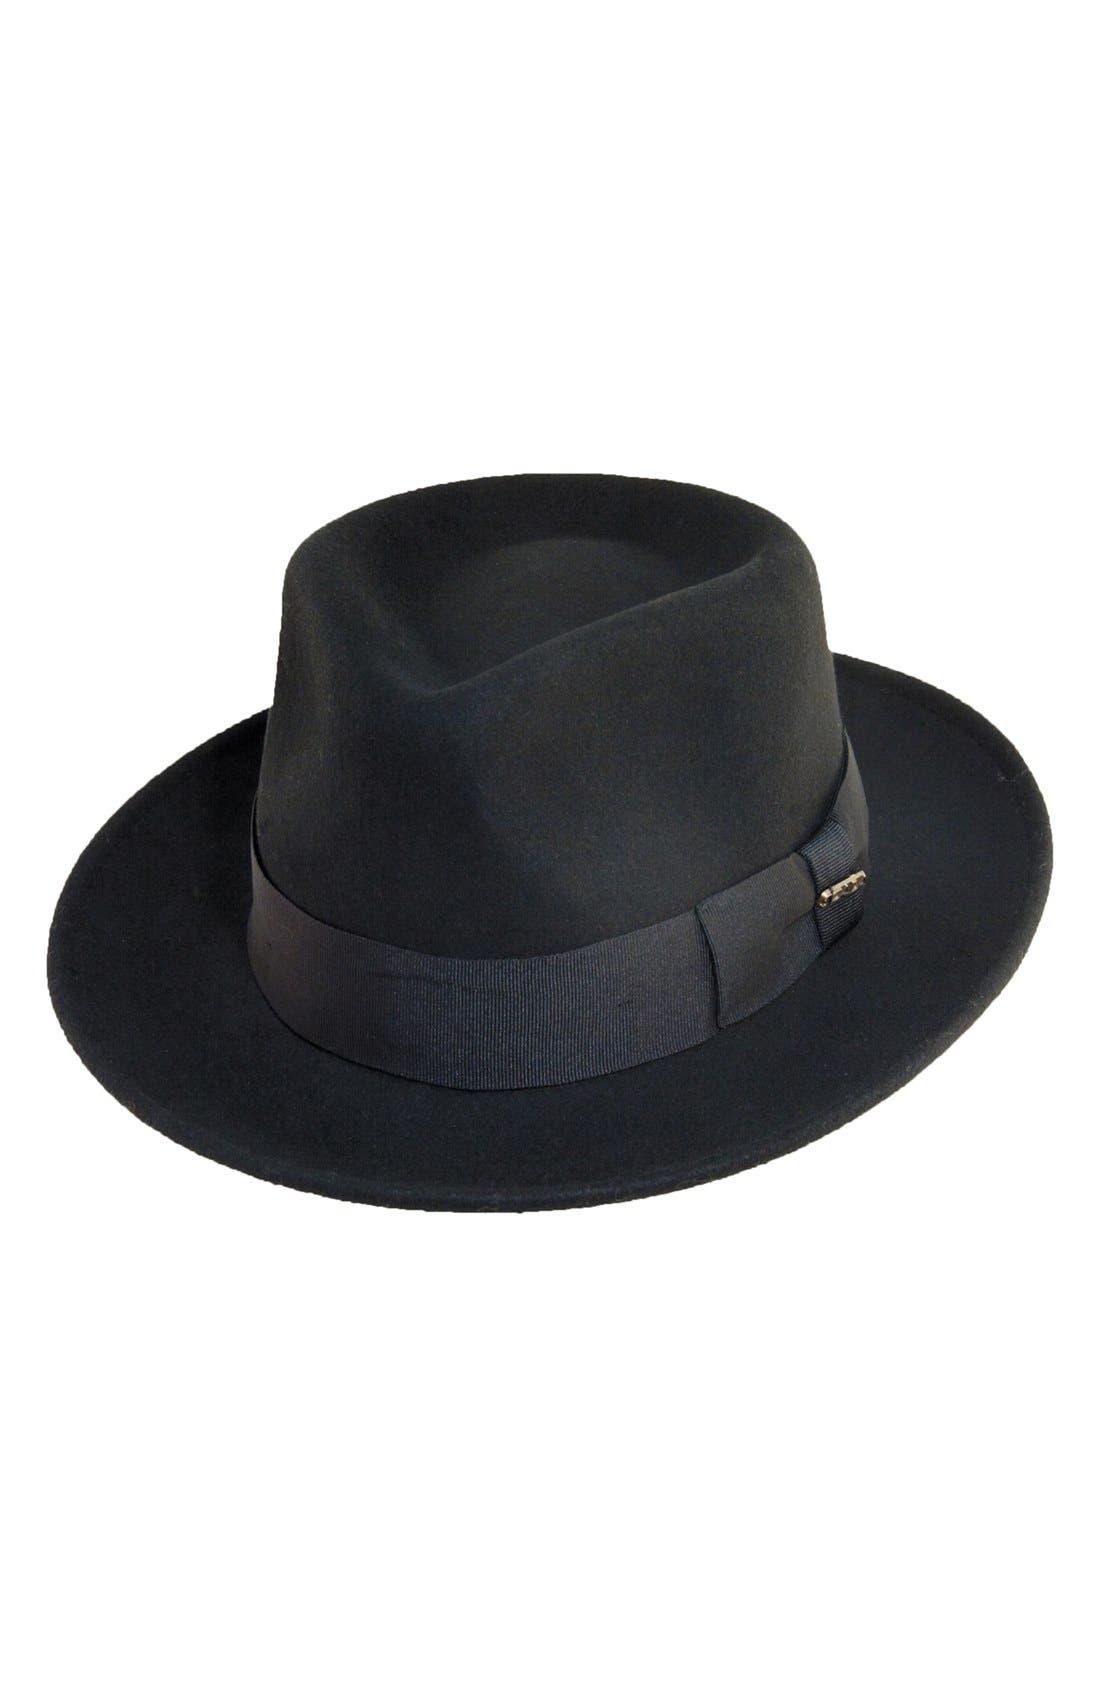 Scala Classico Wool Felt Fedora - Black